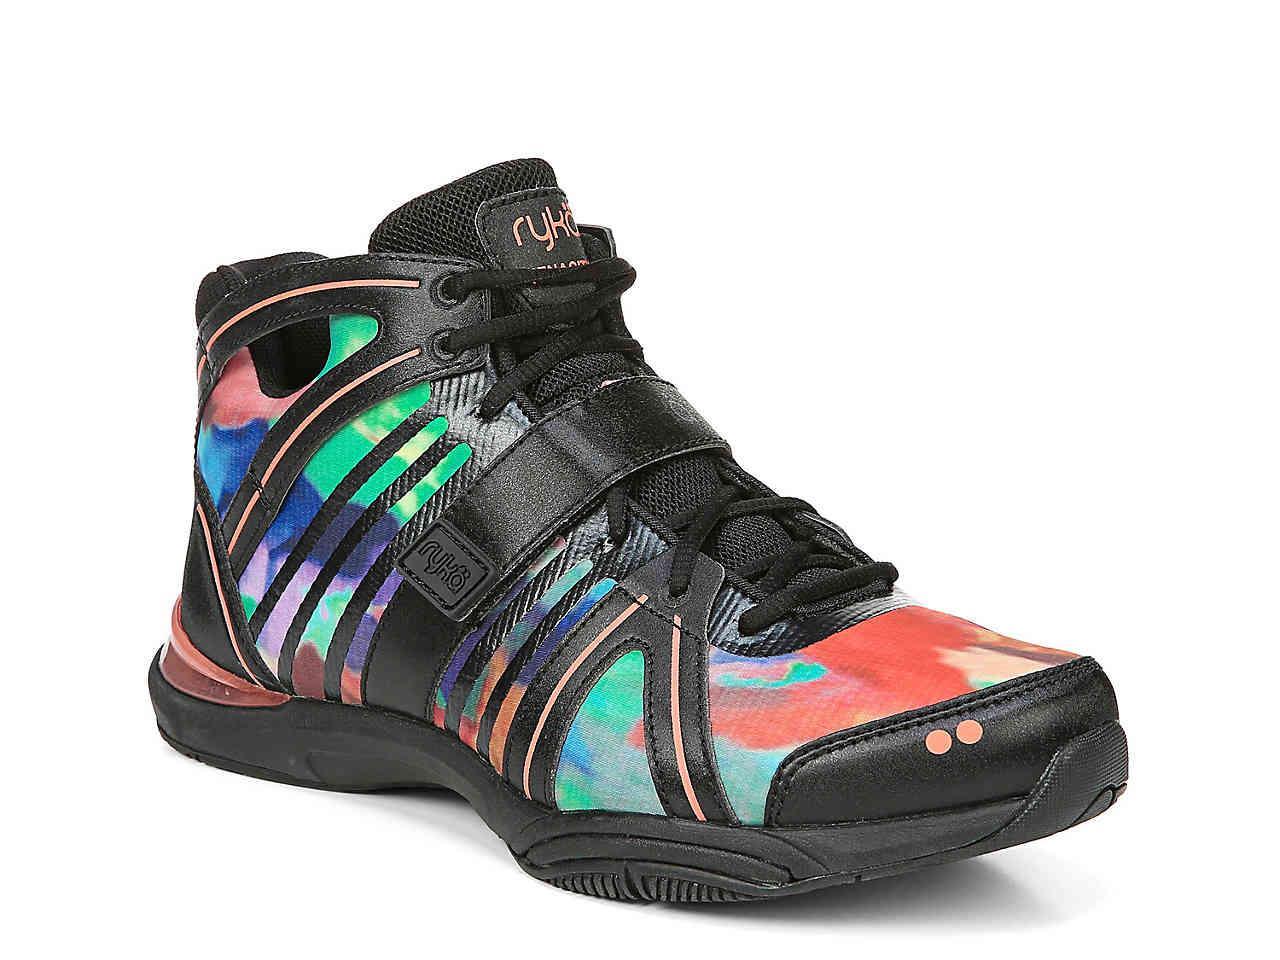 f7b7e5e757 Lyst - Ryka Tenacity Mid-top Training Shoe in Black